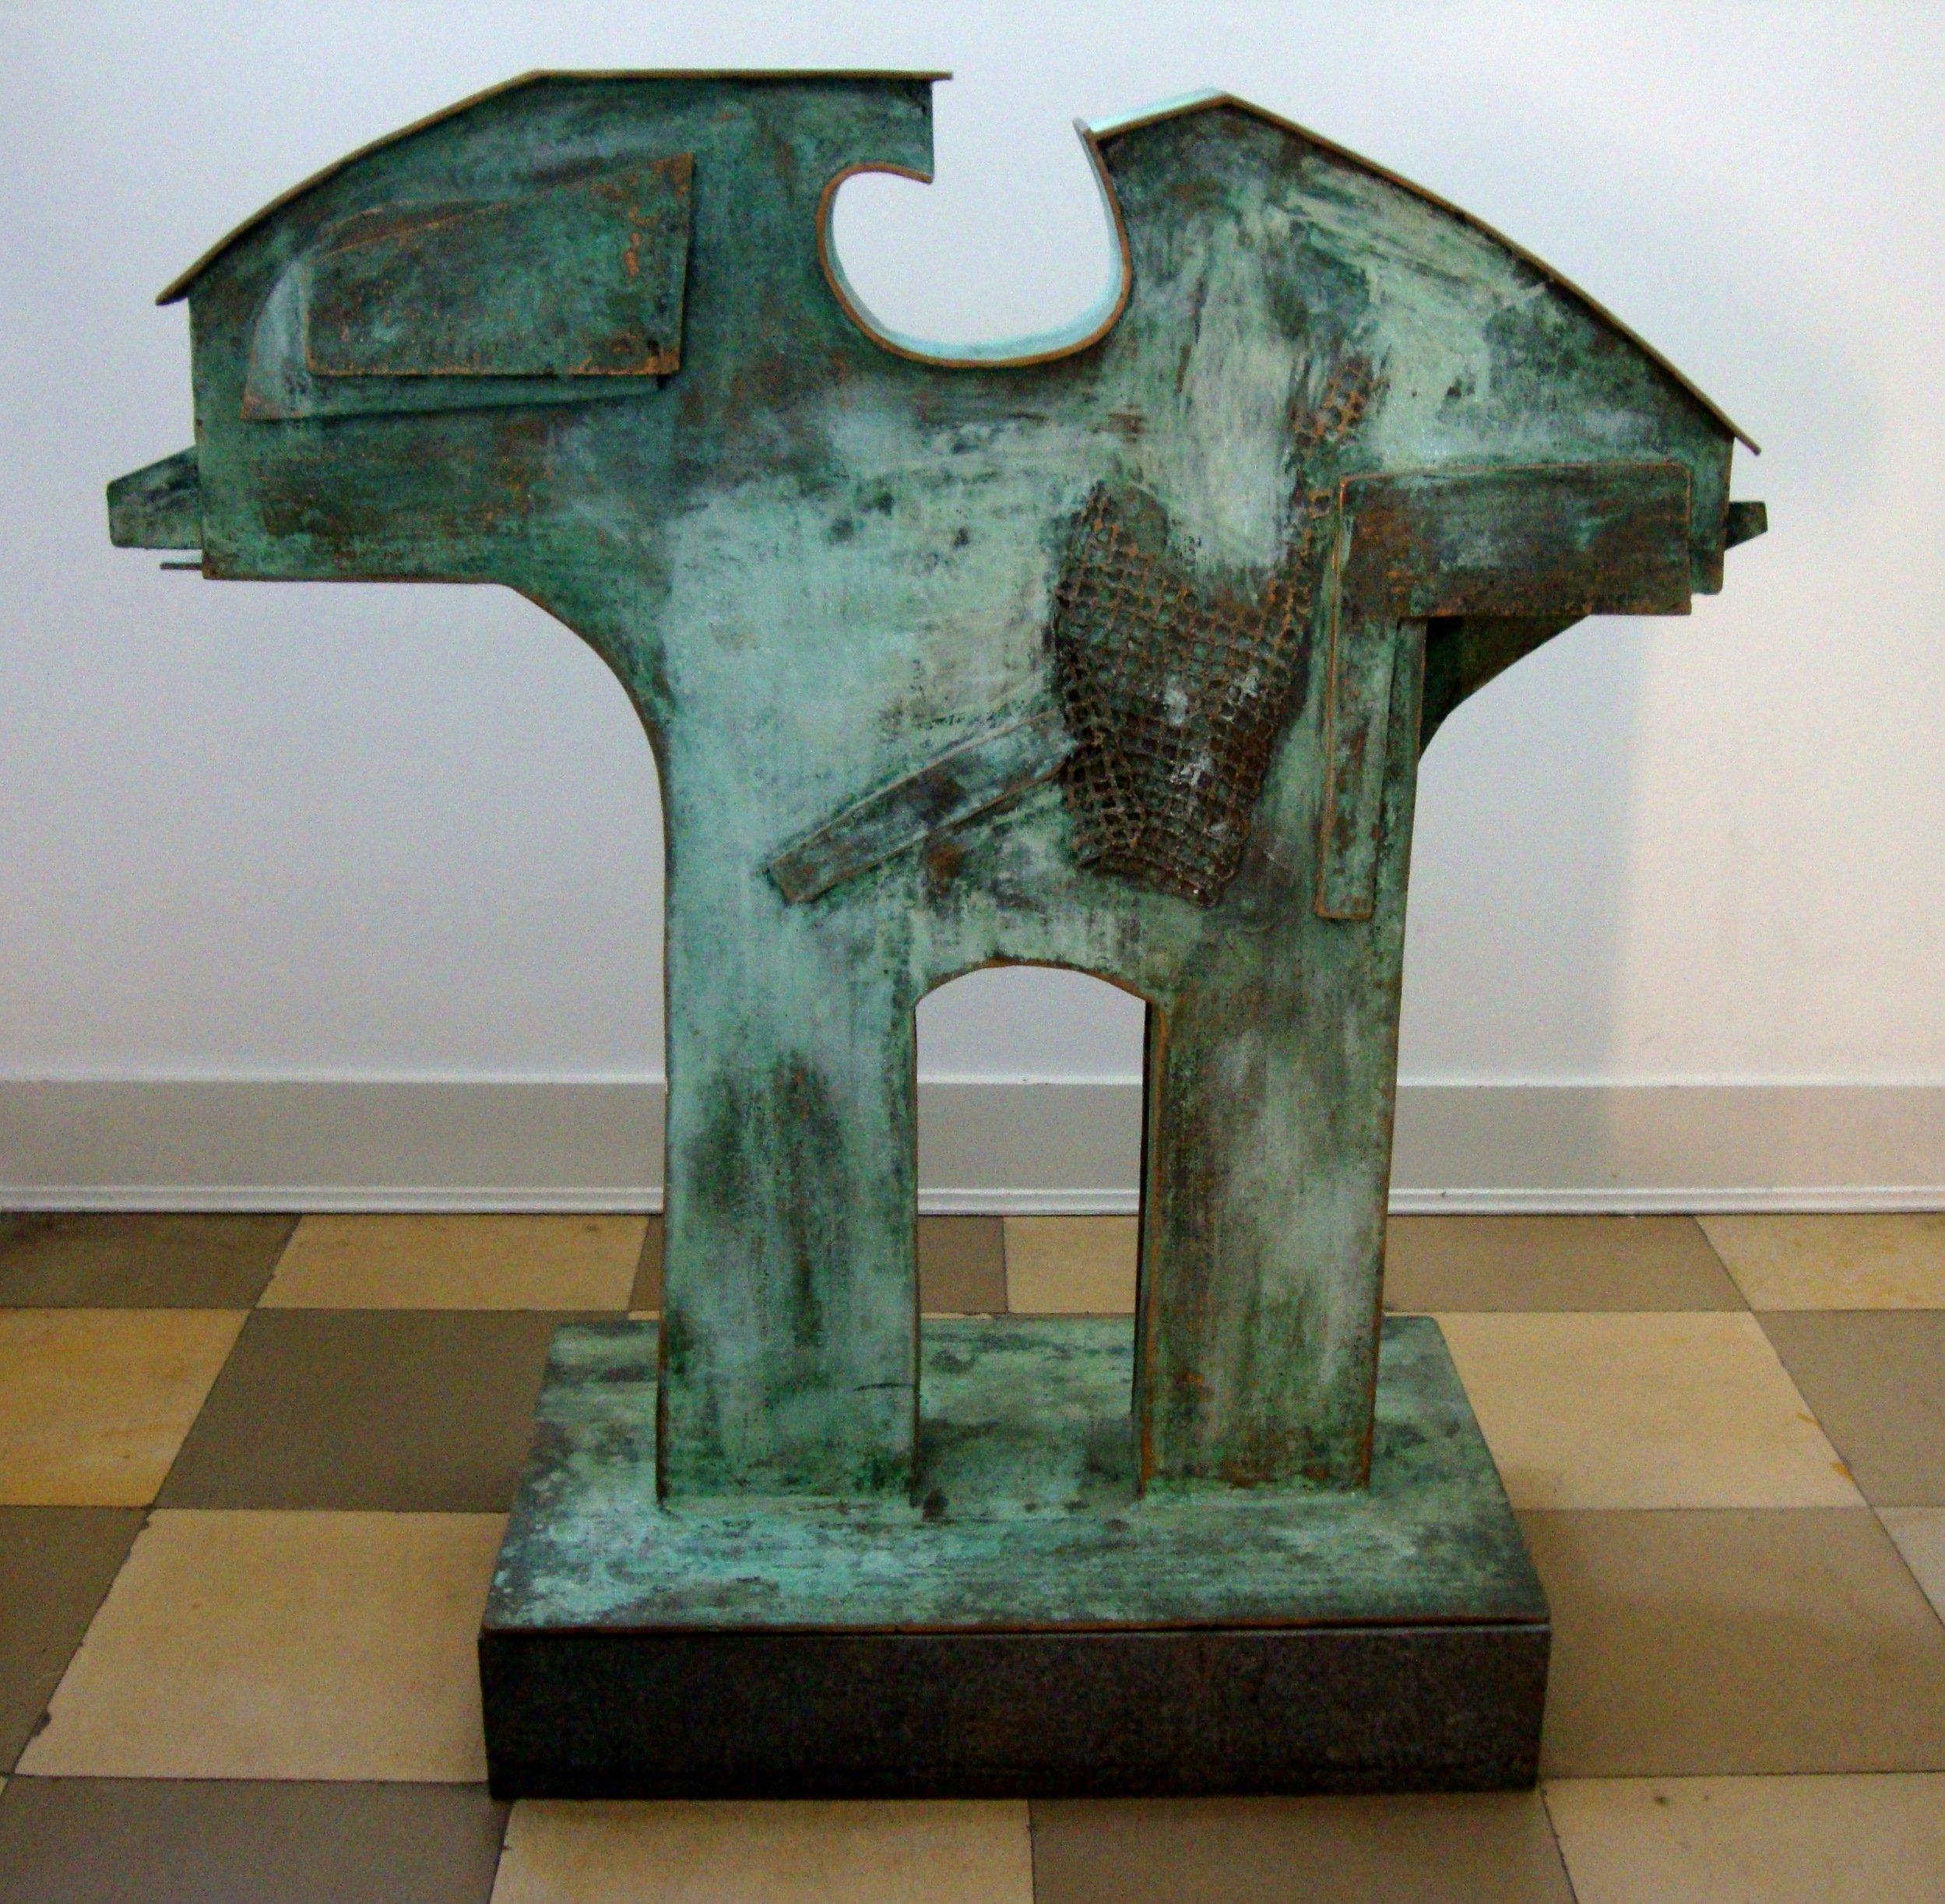 Bronze - Bronze - Mossi - Burkina Faso - Catawiki